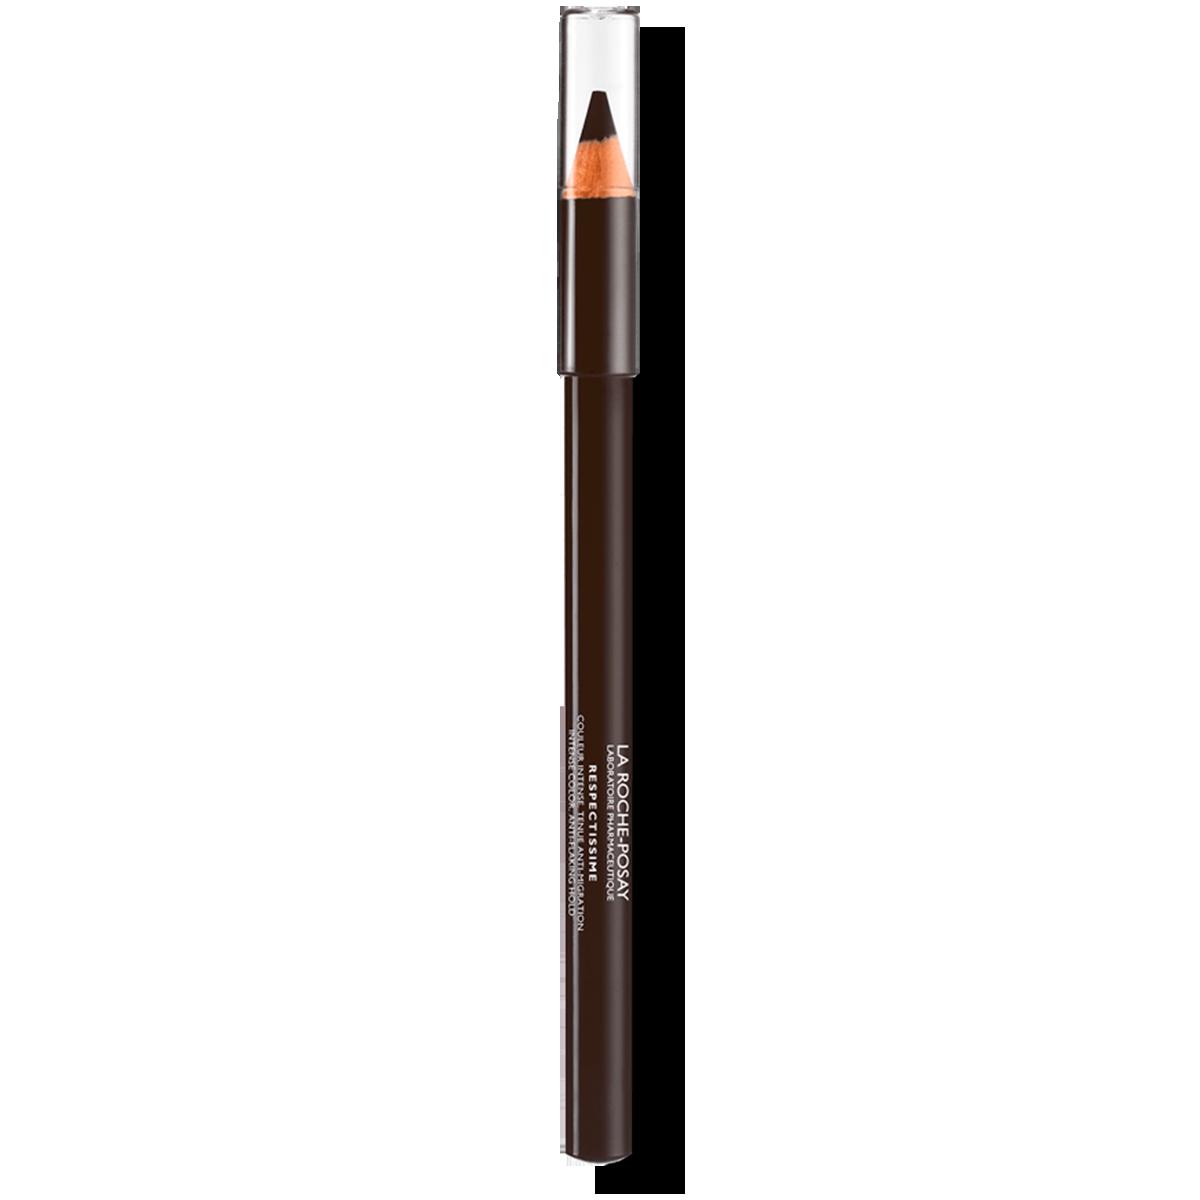 La Roche Posay Sensitive Toleriane Make up EYE_PENCIL Brown 3337872410